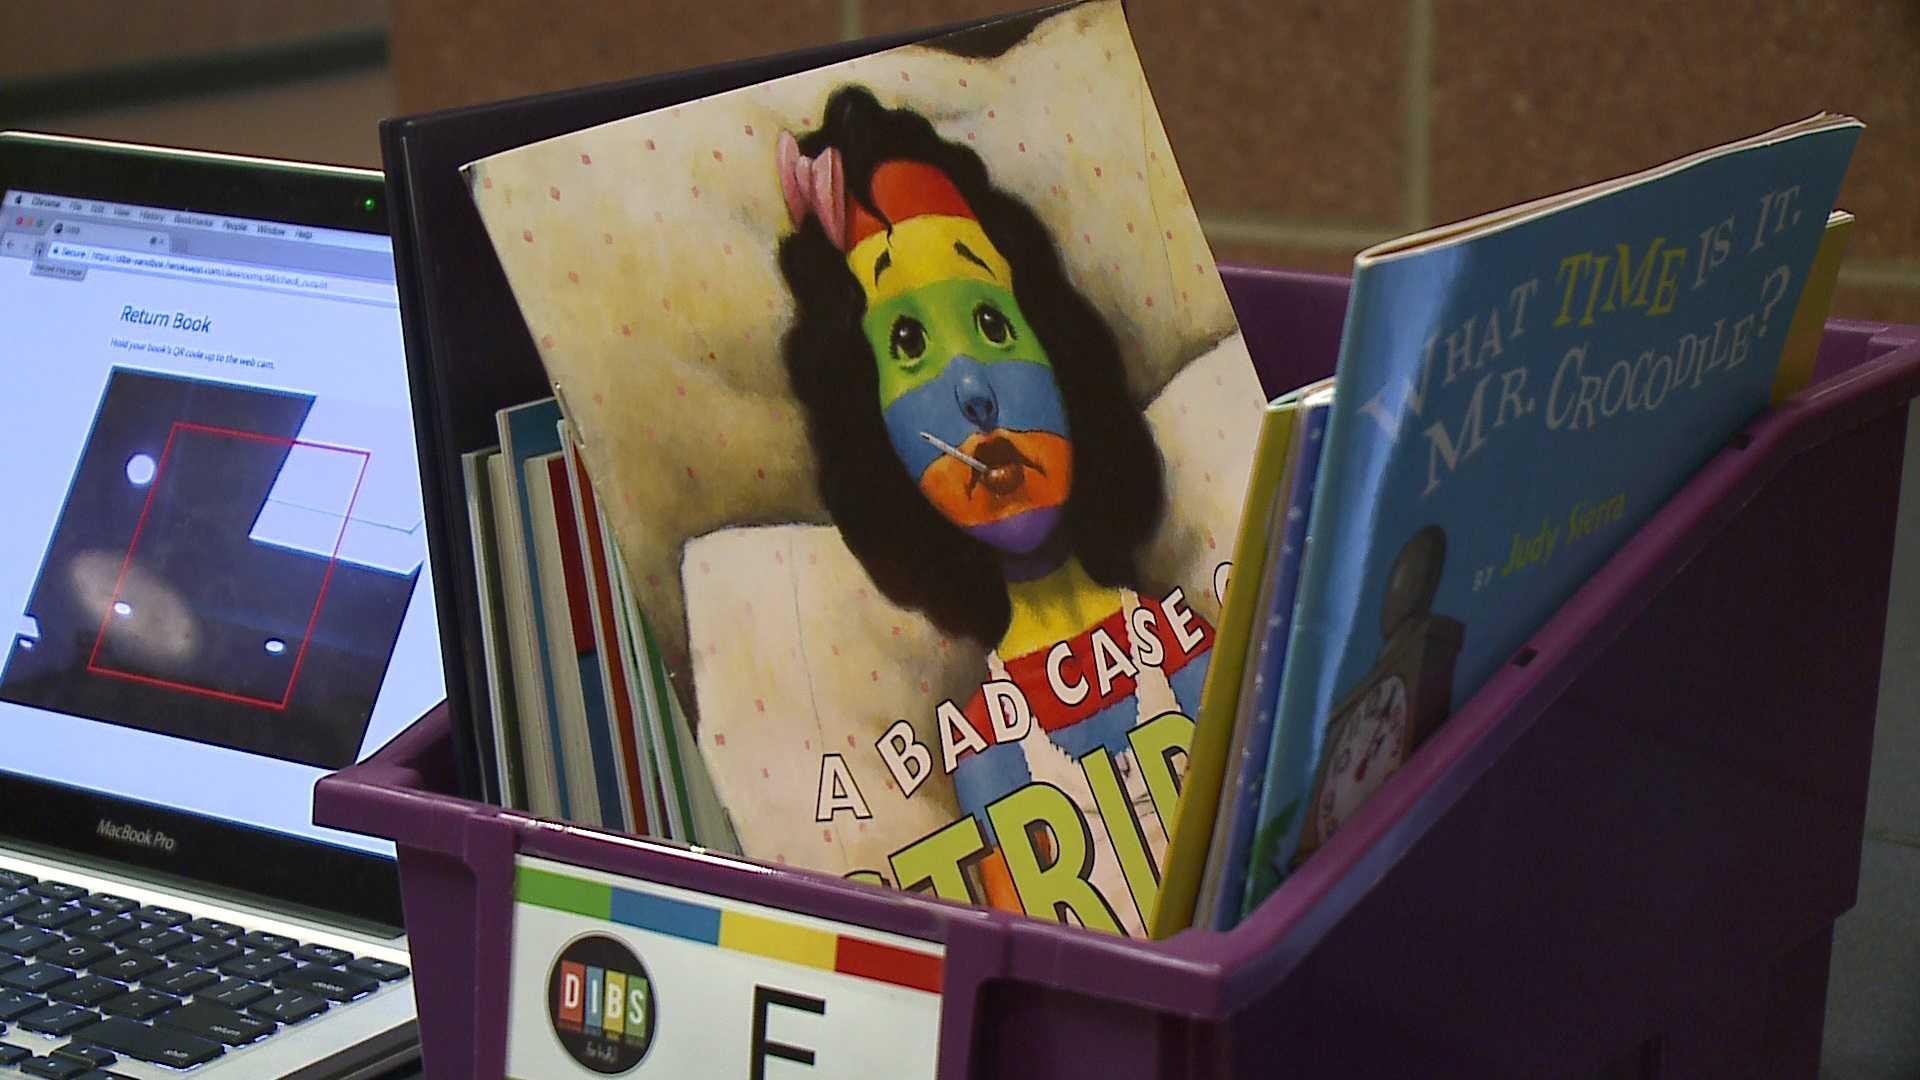 Local program working to put books into the hands of school children across Omaha